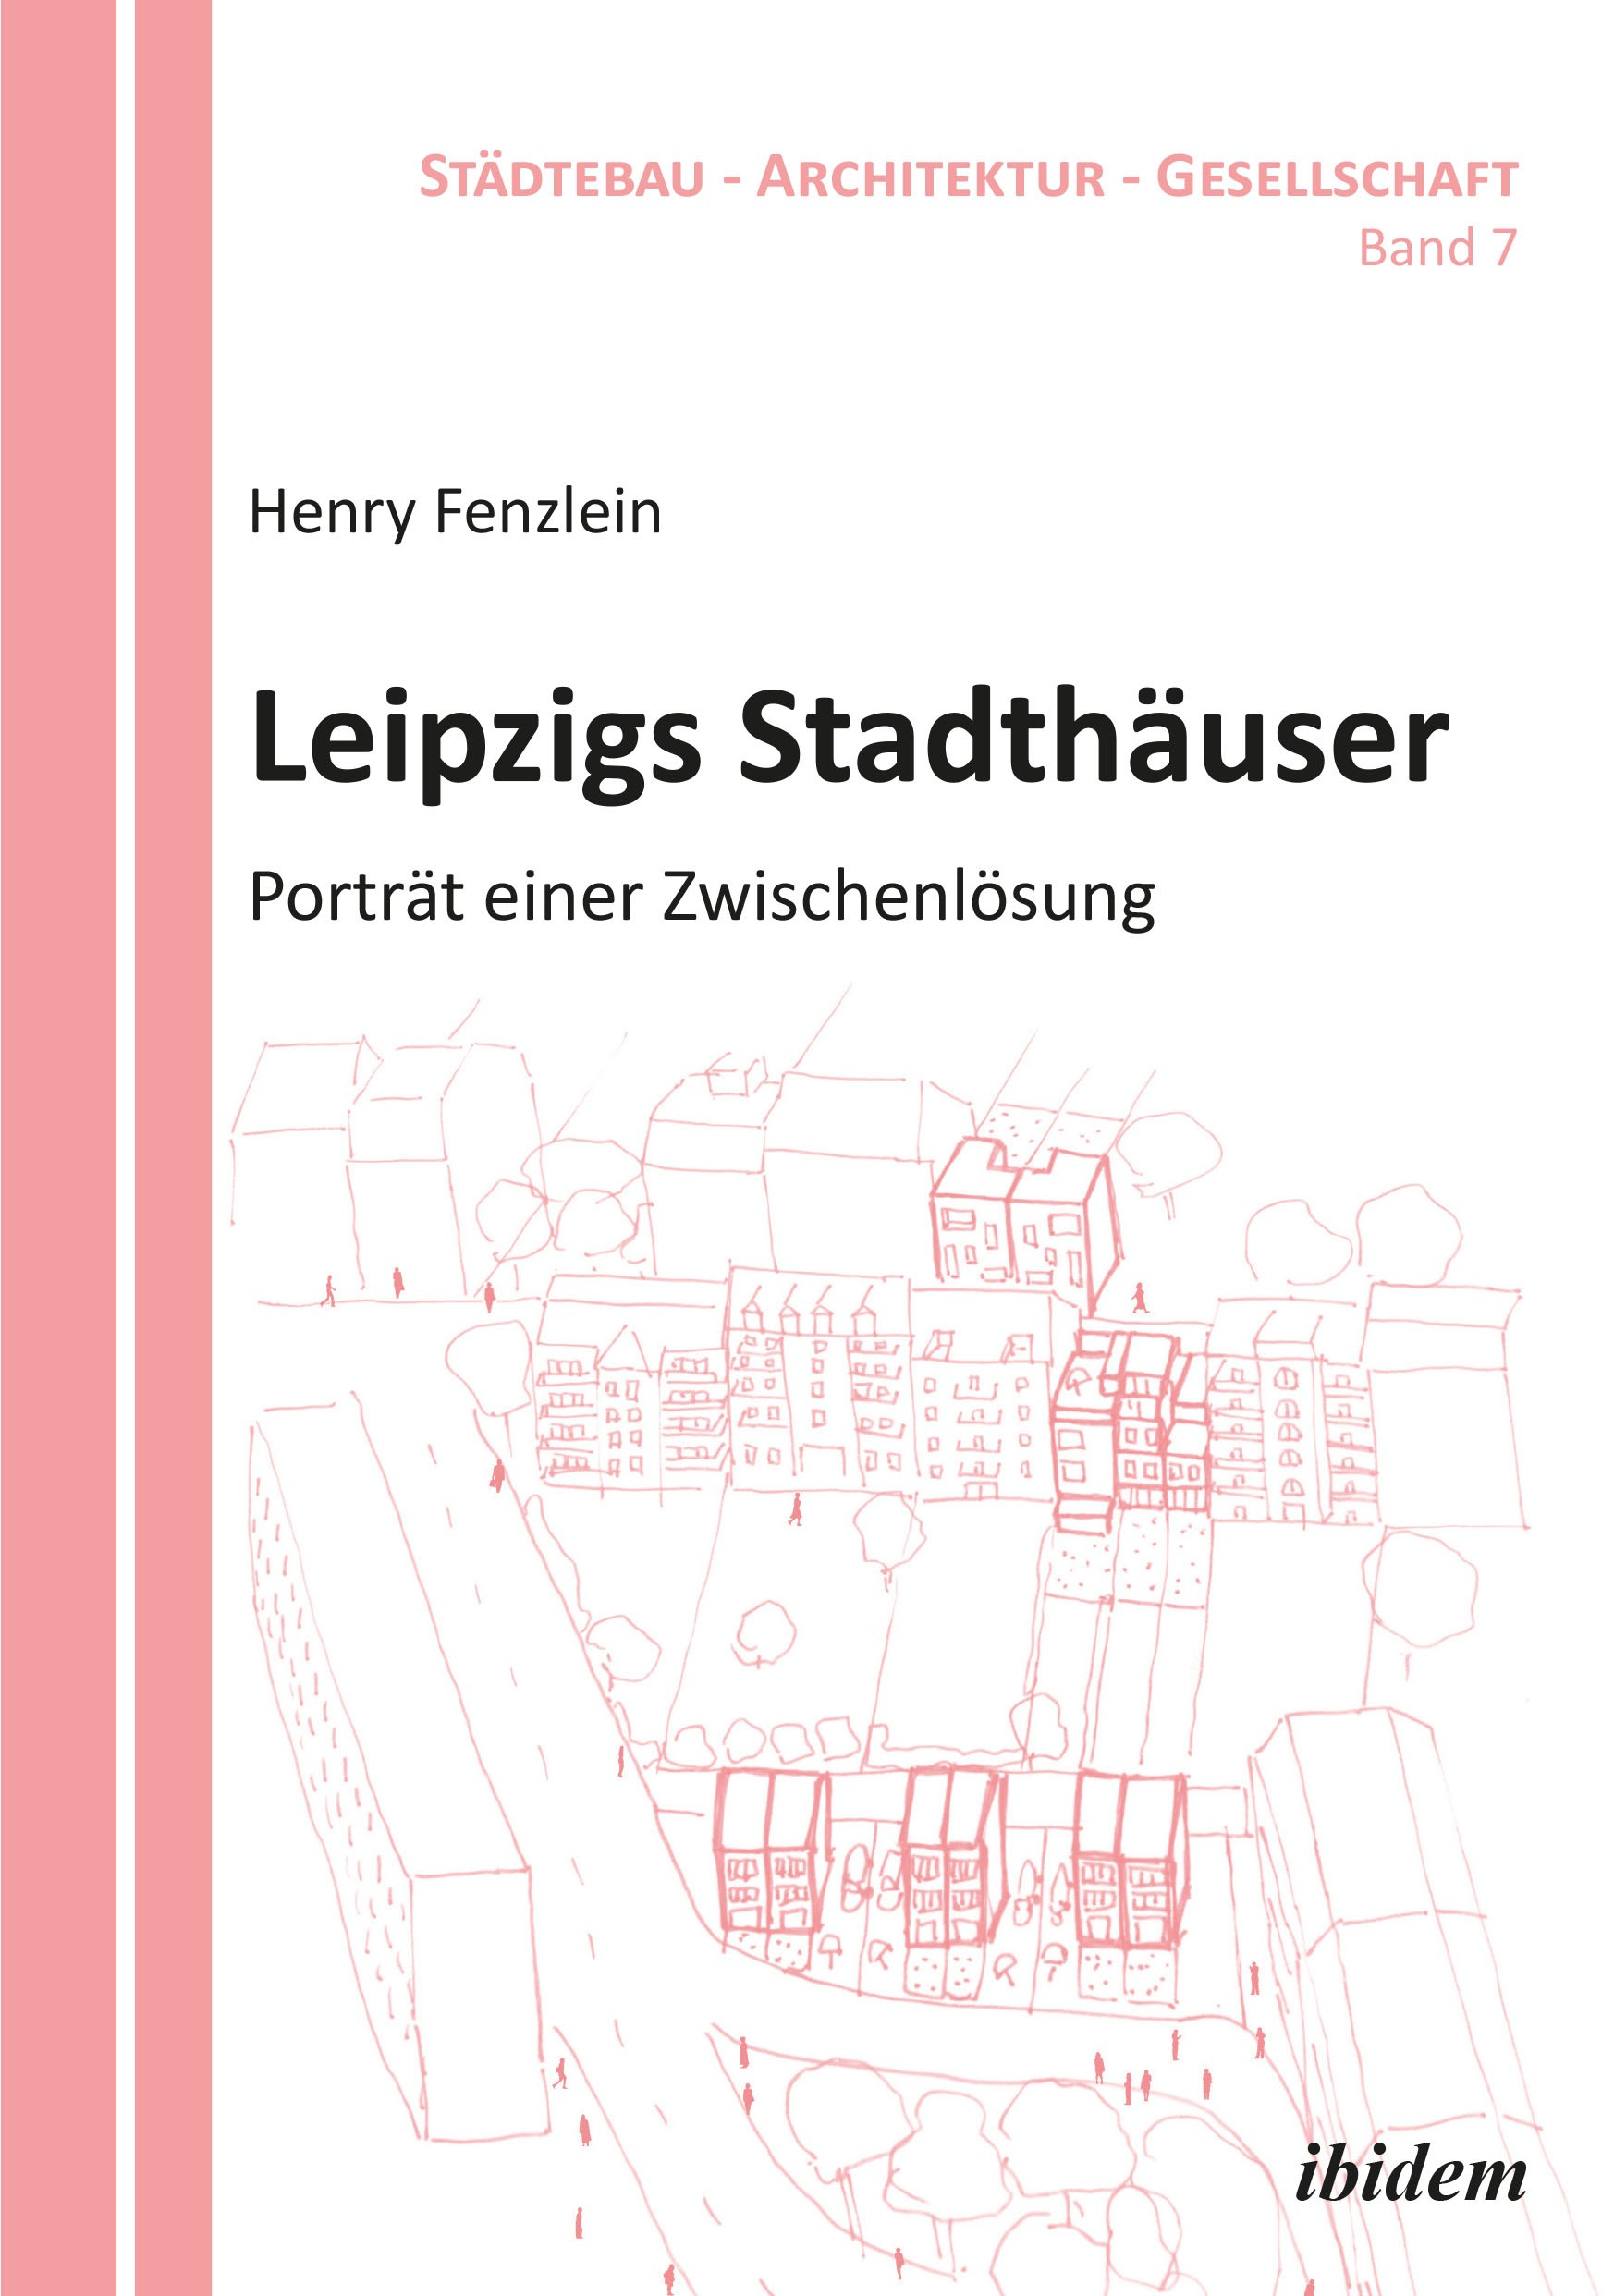 Leipzigs Stadthäuser